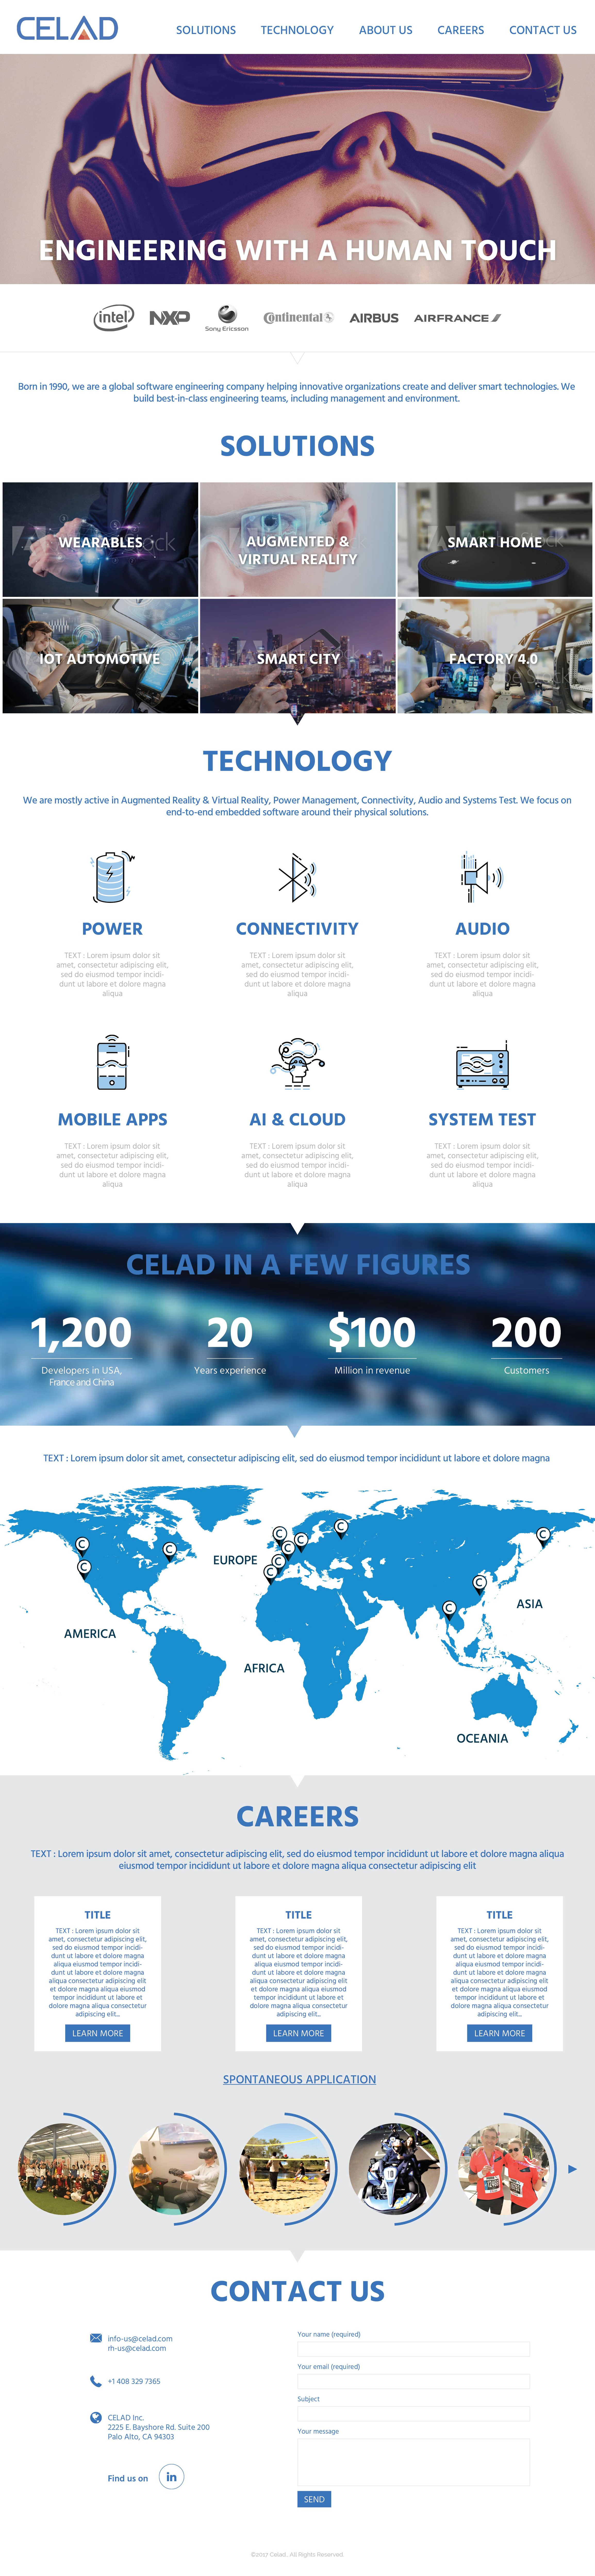 Celad webpage webdesign